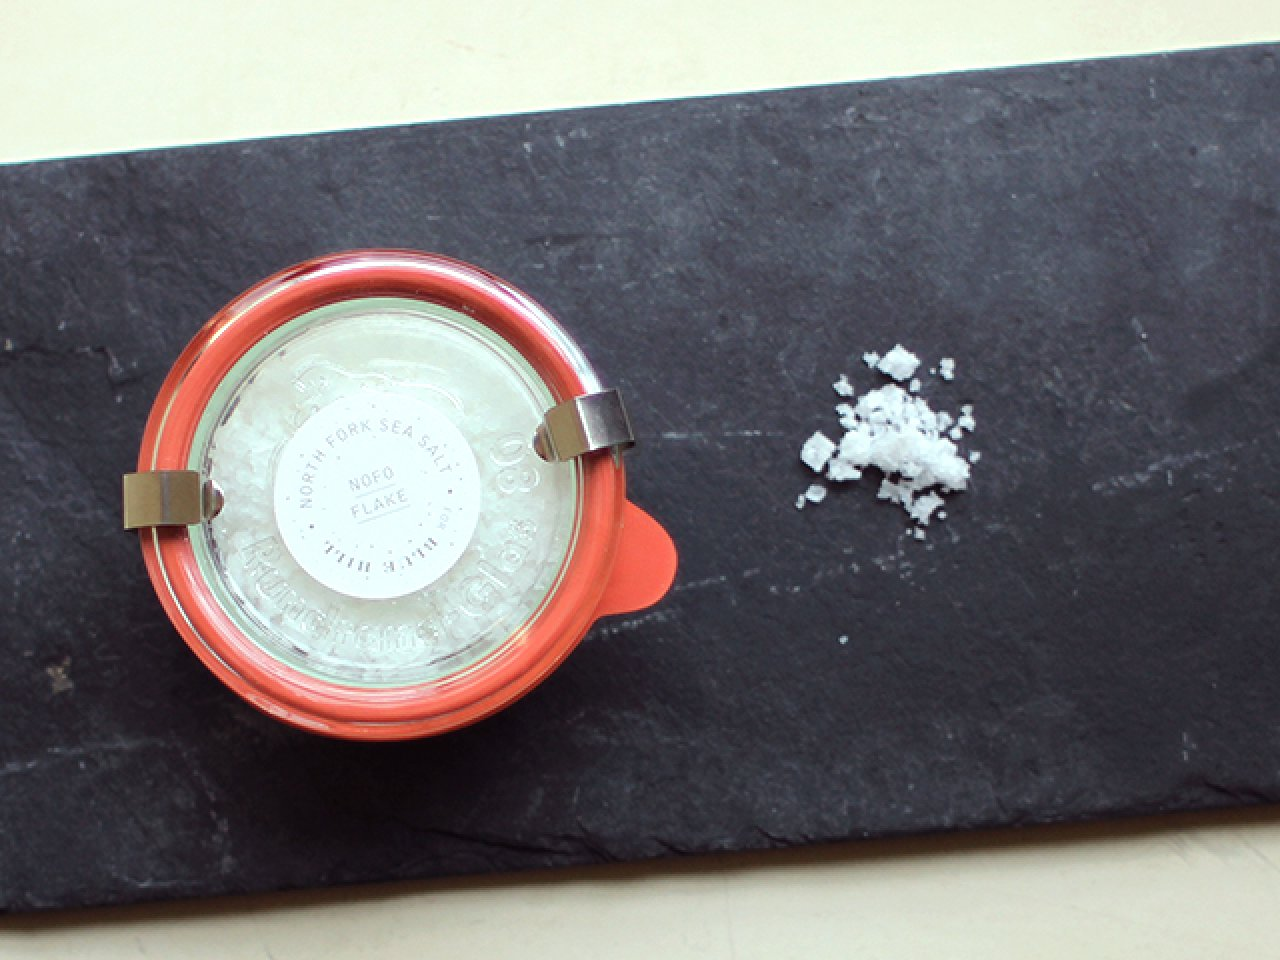 North Fork Sea Salt - Classic Flake (Large)